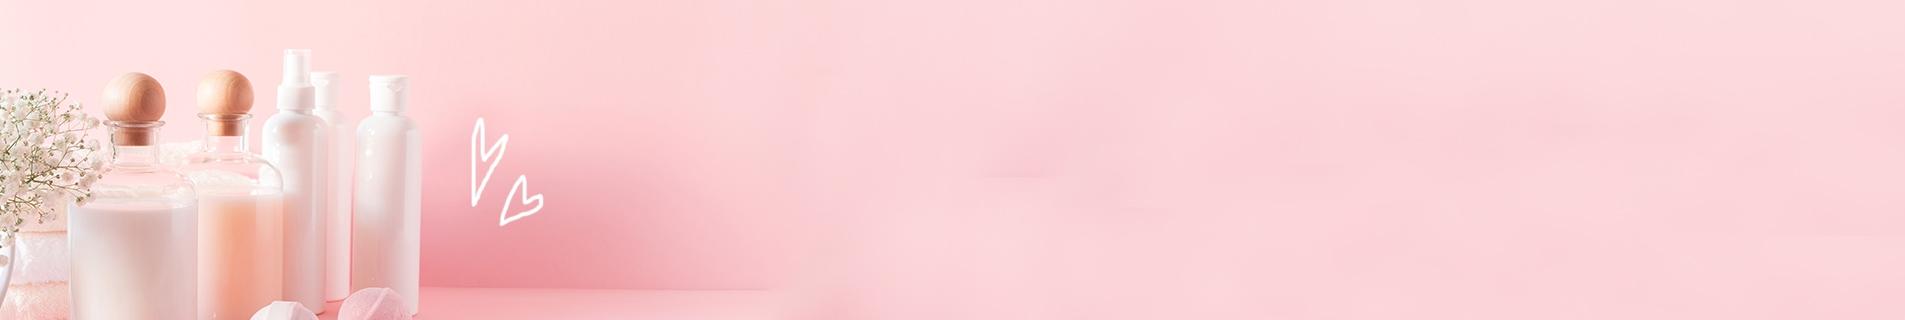 Promo moins de 10€ | Site de cosmétique pas cher | SAGA Cosmetics